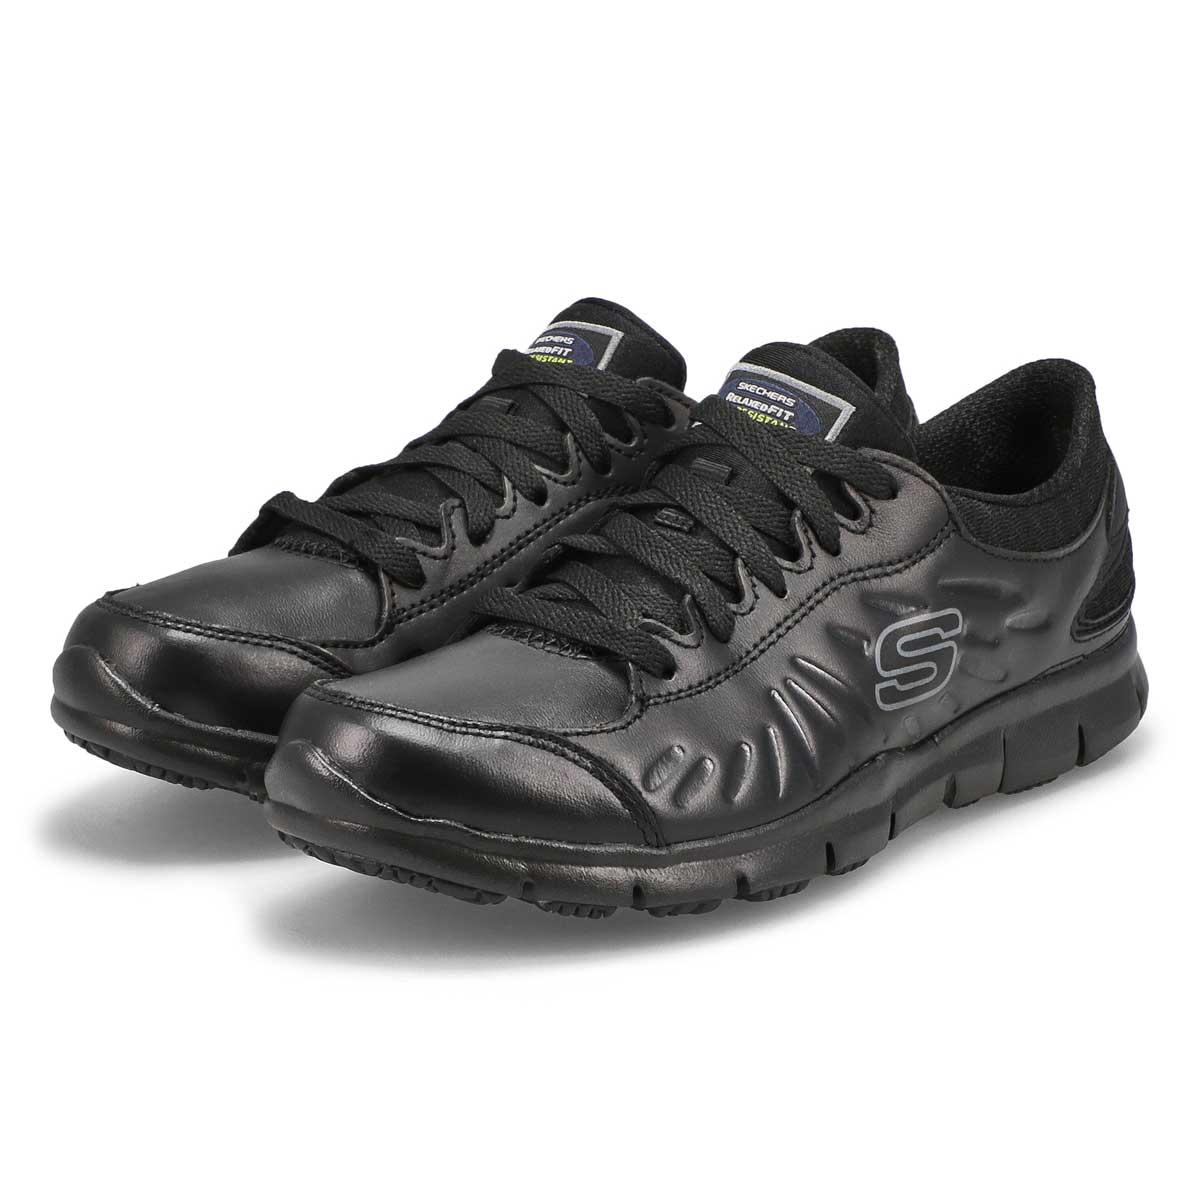 Lds Eldred black slip-resis lace-up work